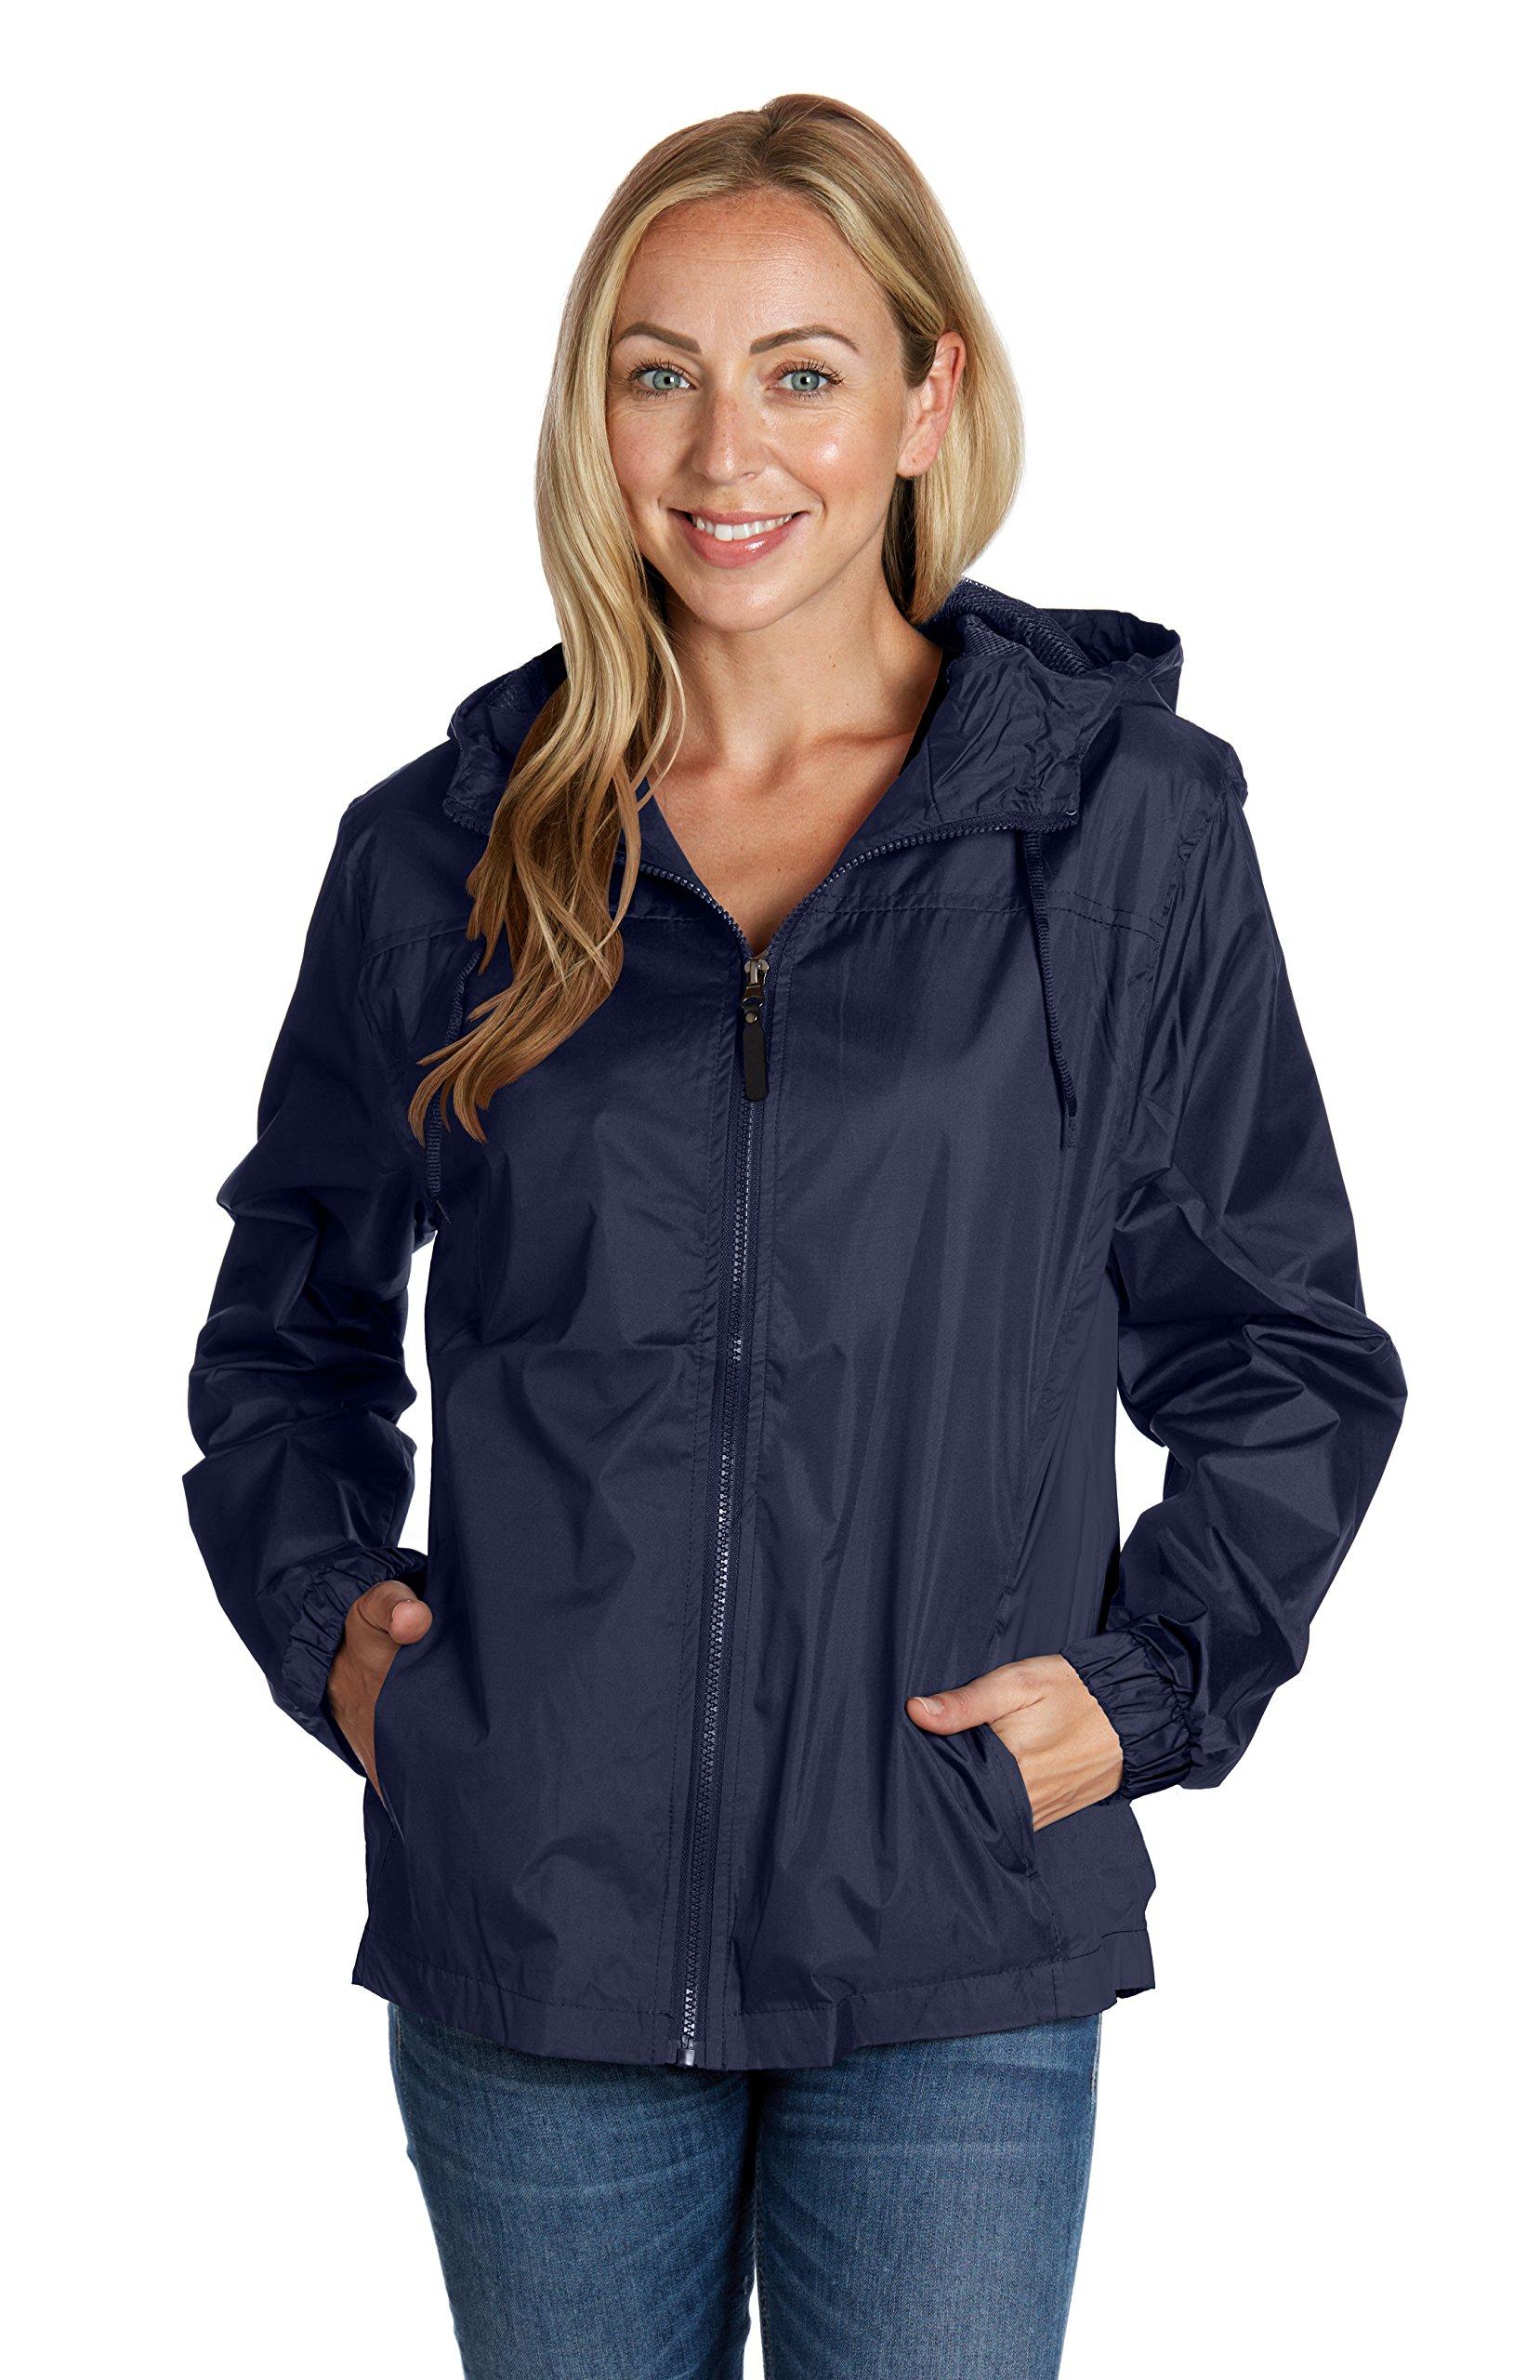 Equipment De Sport USA Basketball Jackets for Women Ladies Hooded Navy Blue Windbreaker (2XL)